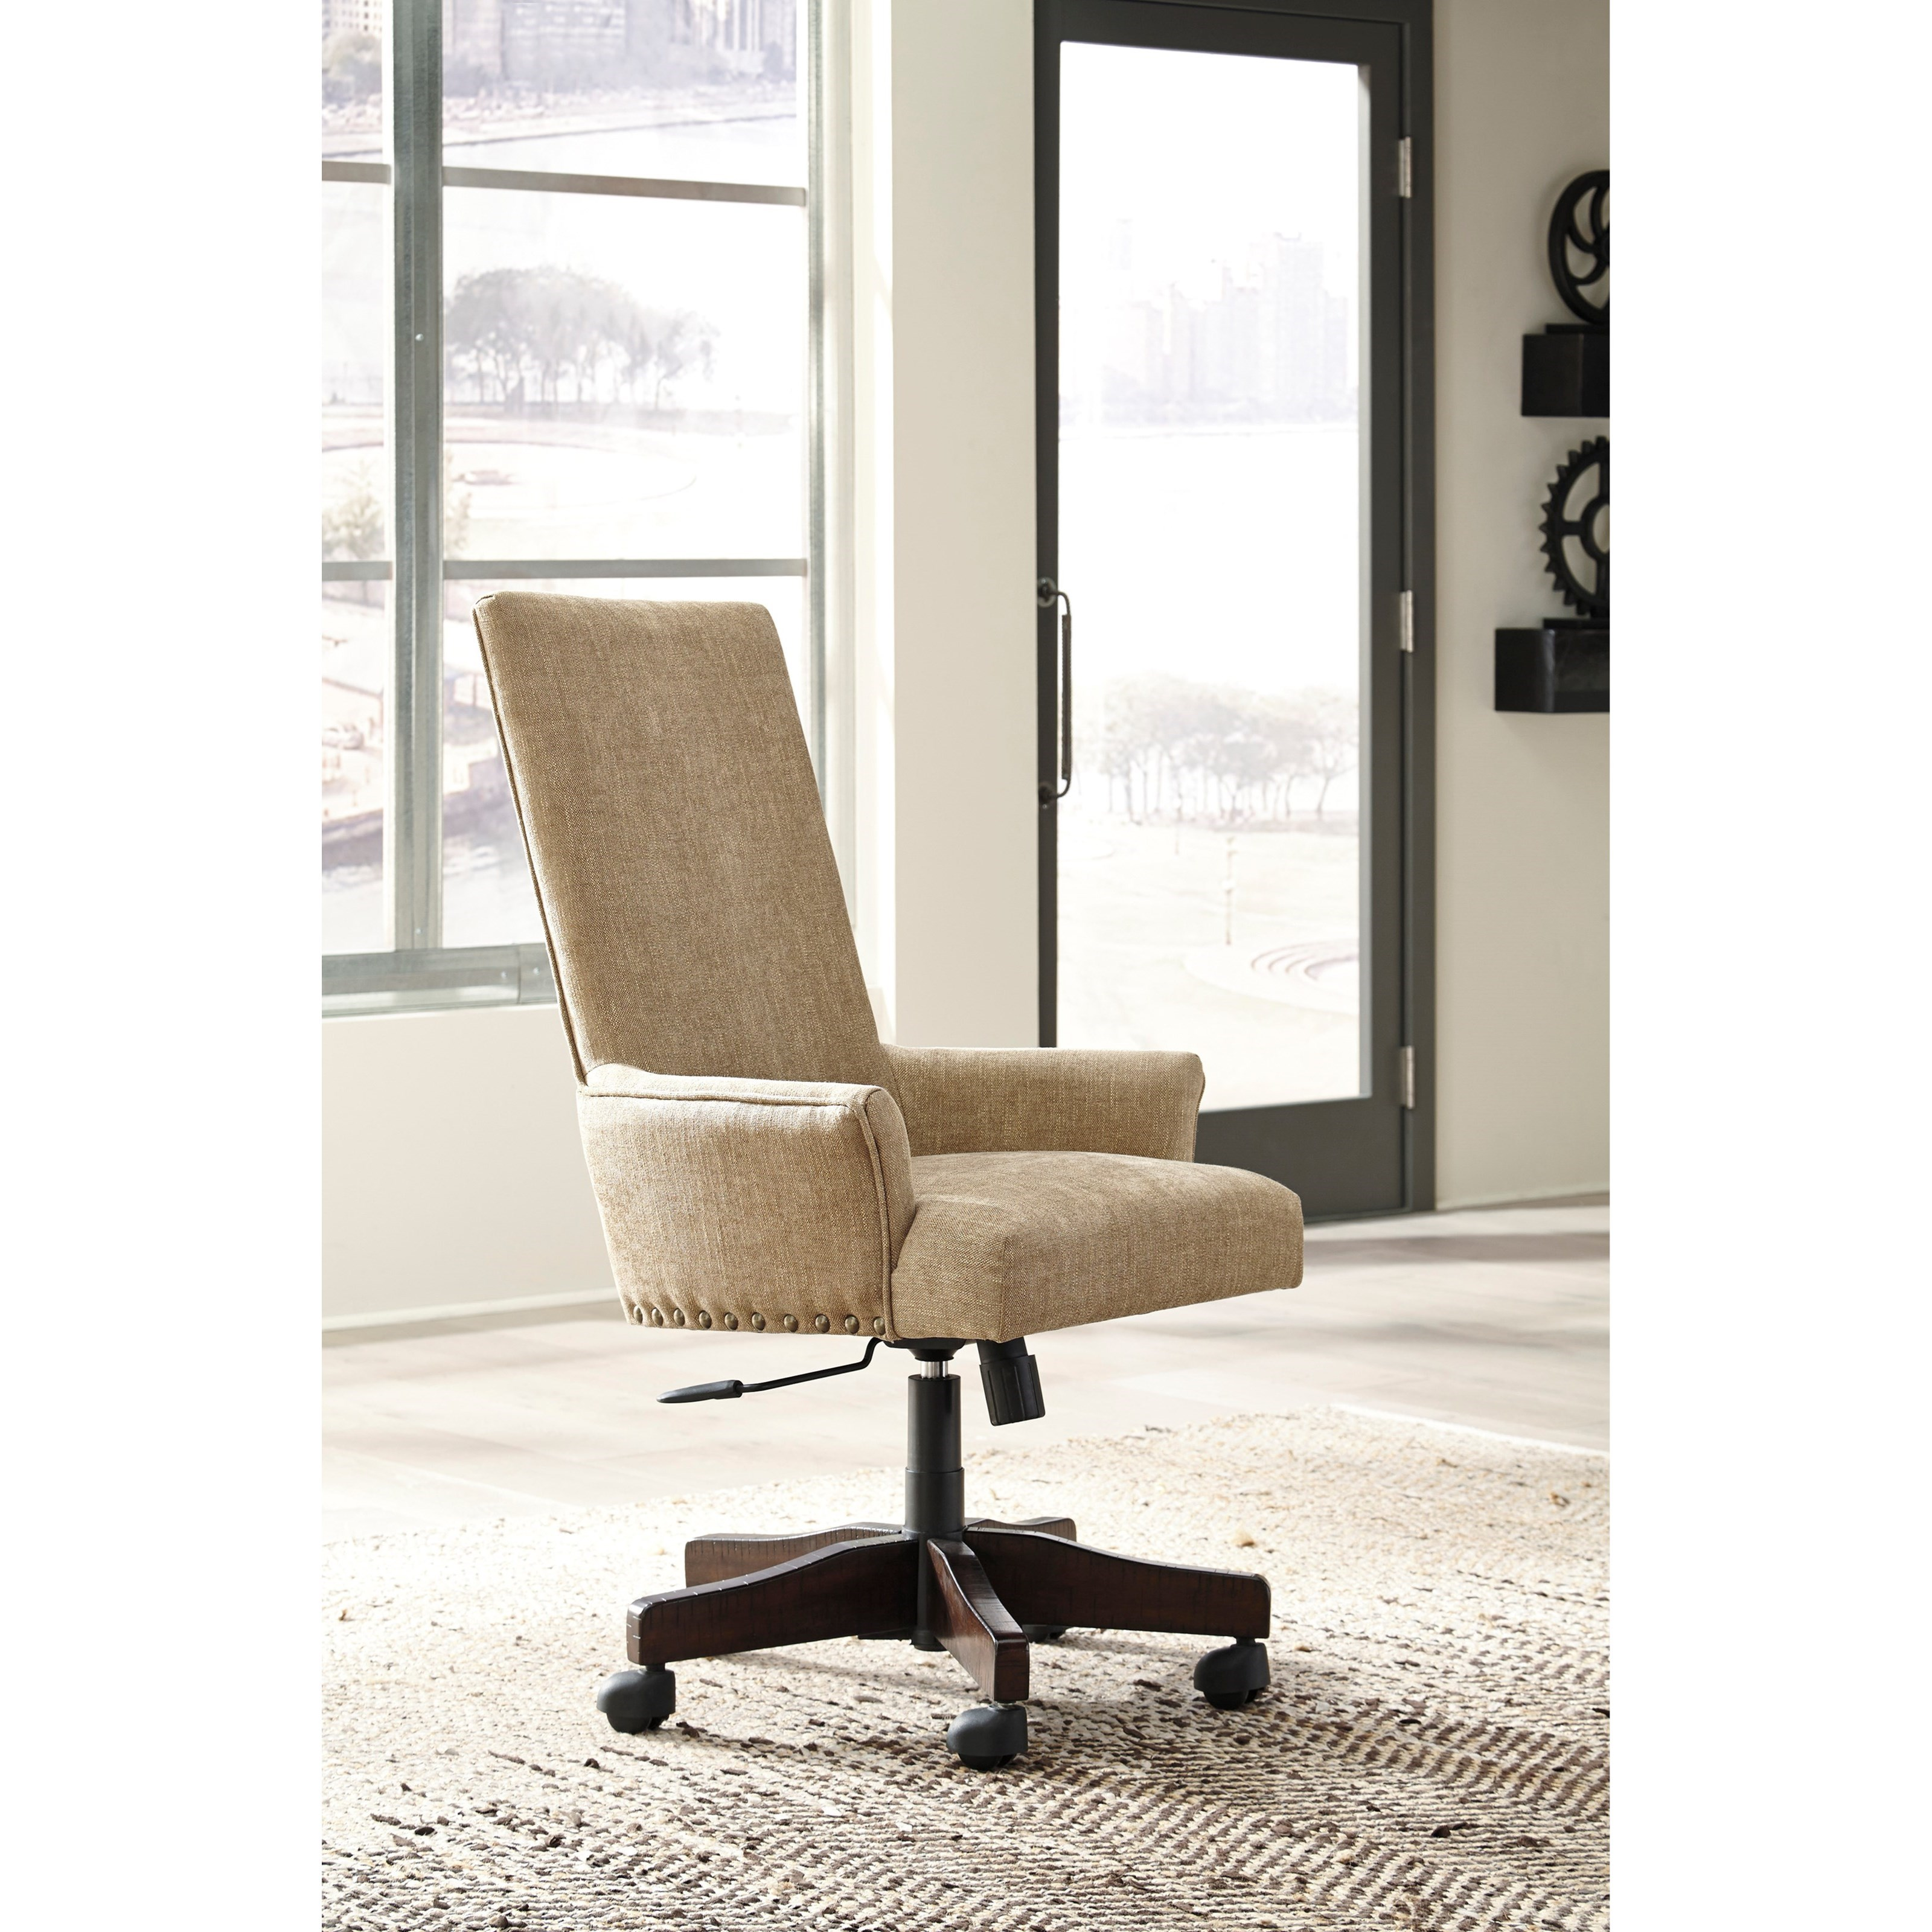 Upholstered swivel desk chair - Contemporary Upholstered Swivel Desk Chair With Nailhead Trim